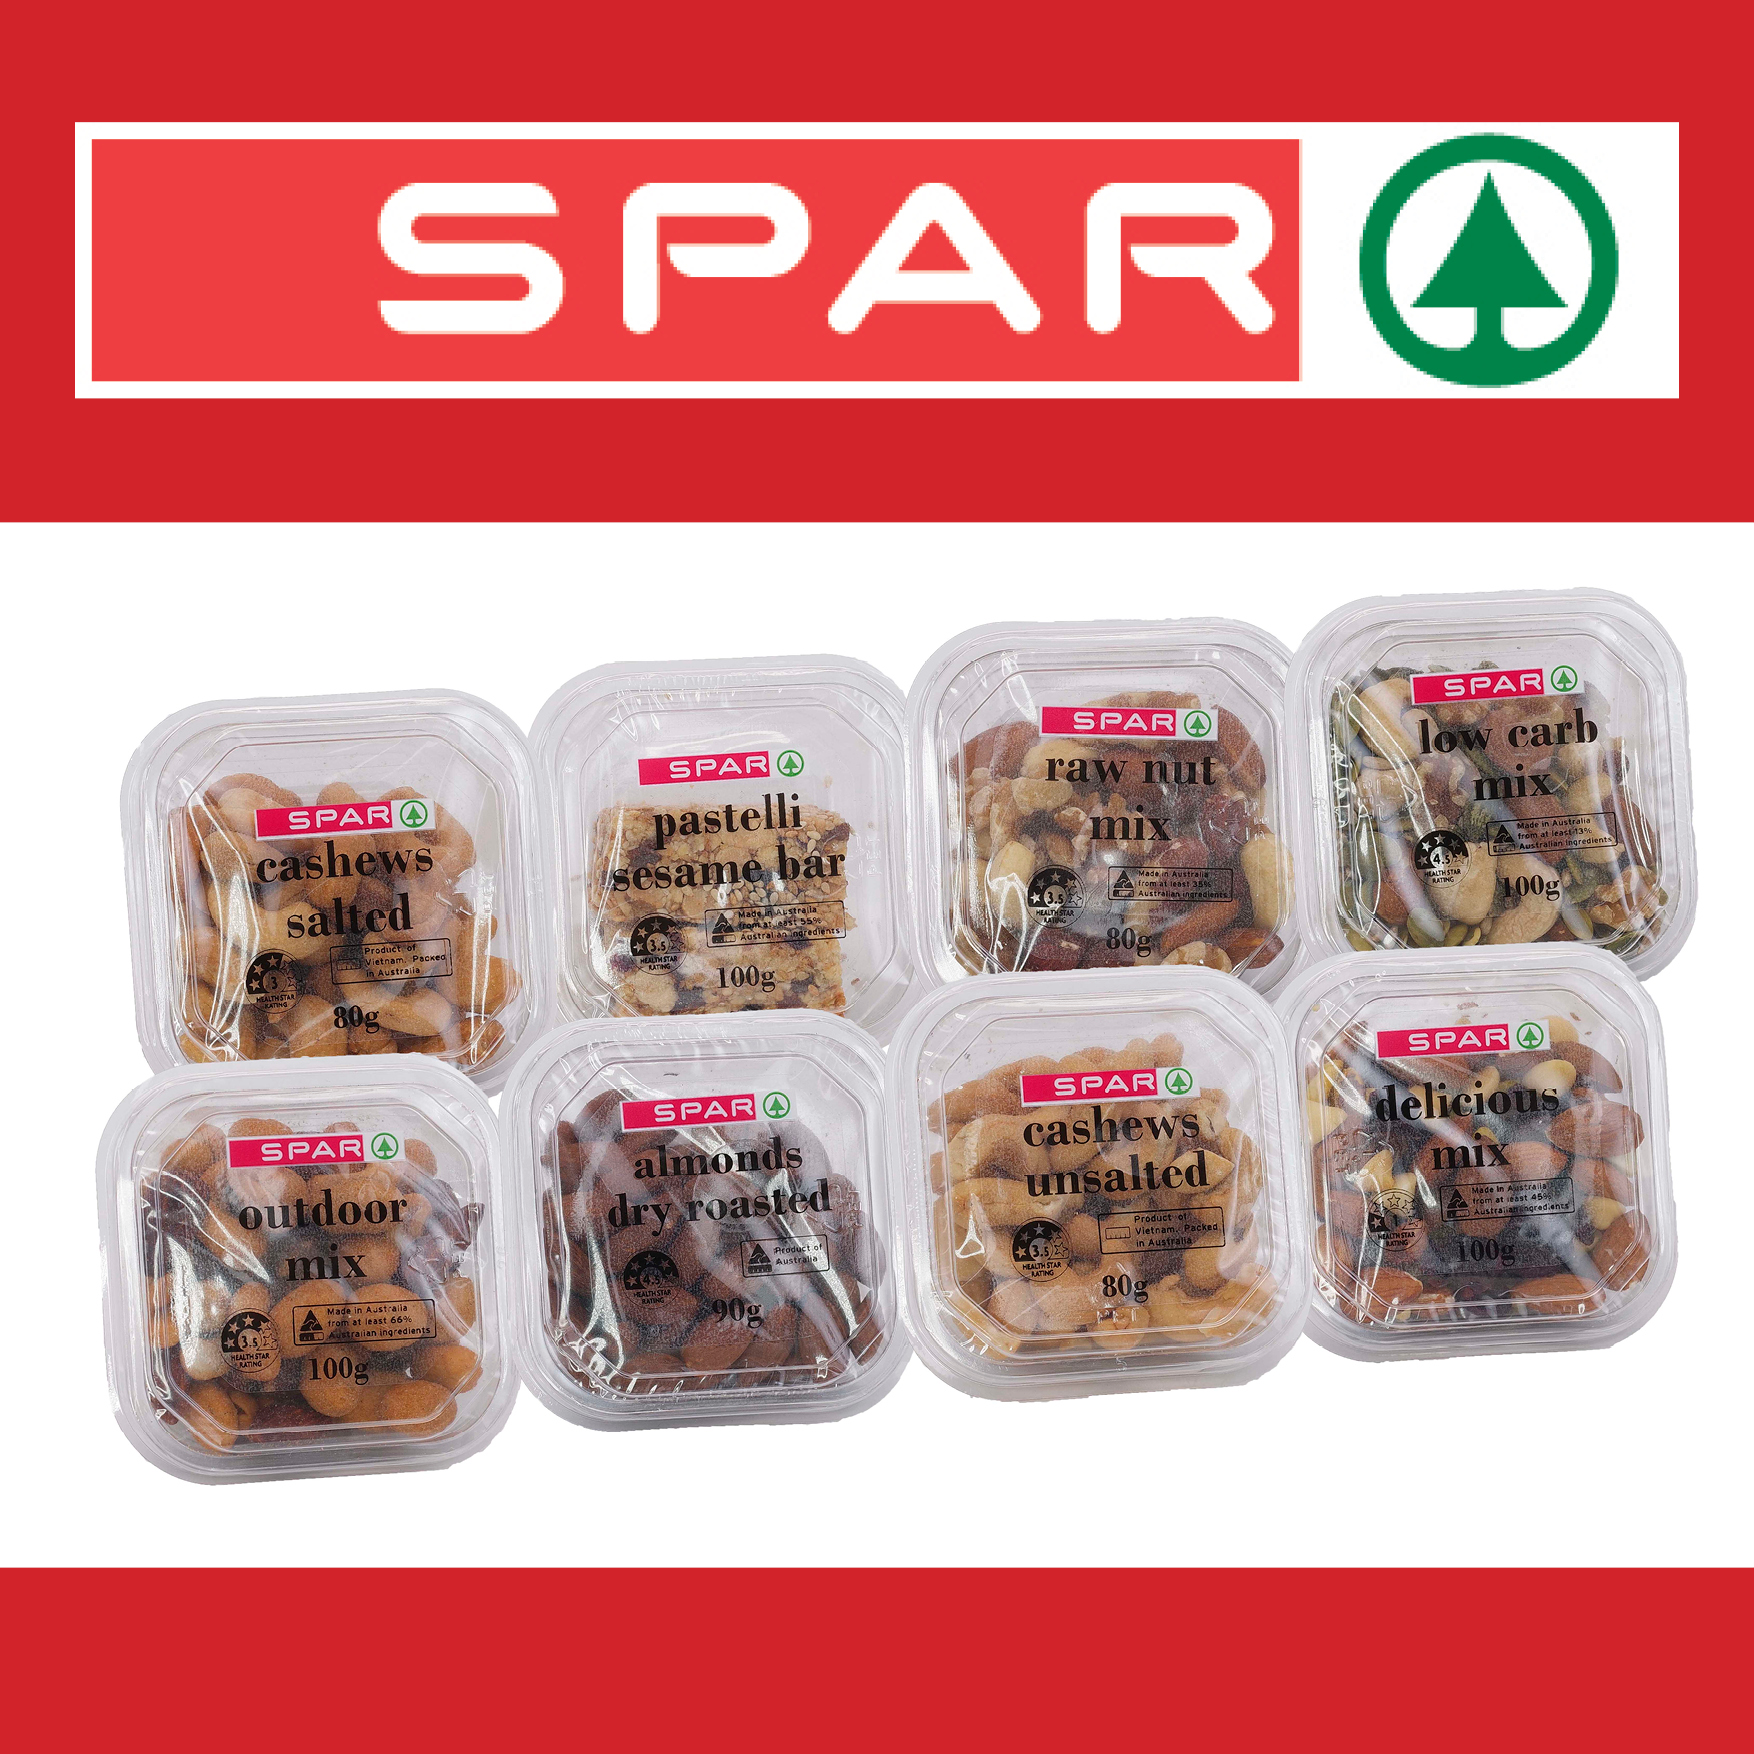 SPAR Snack range